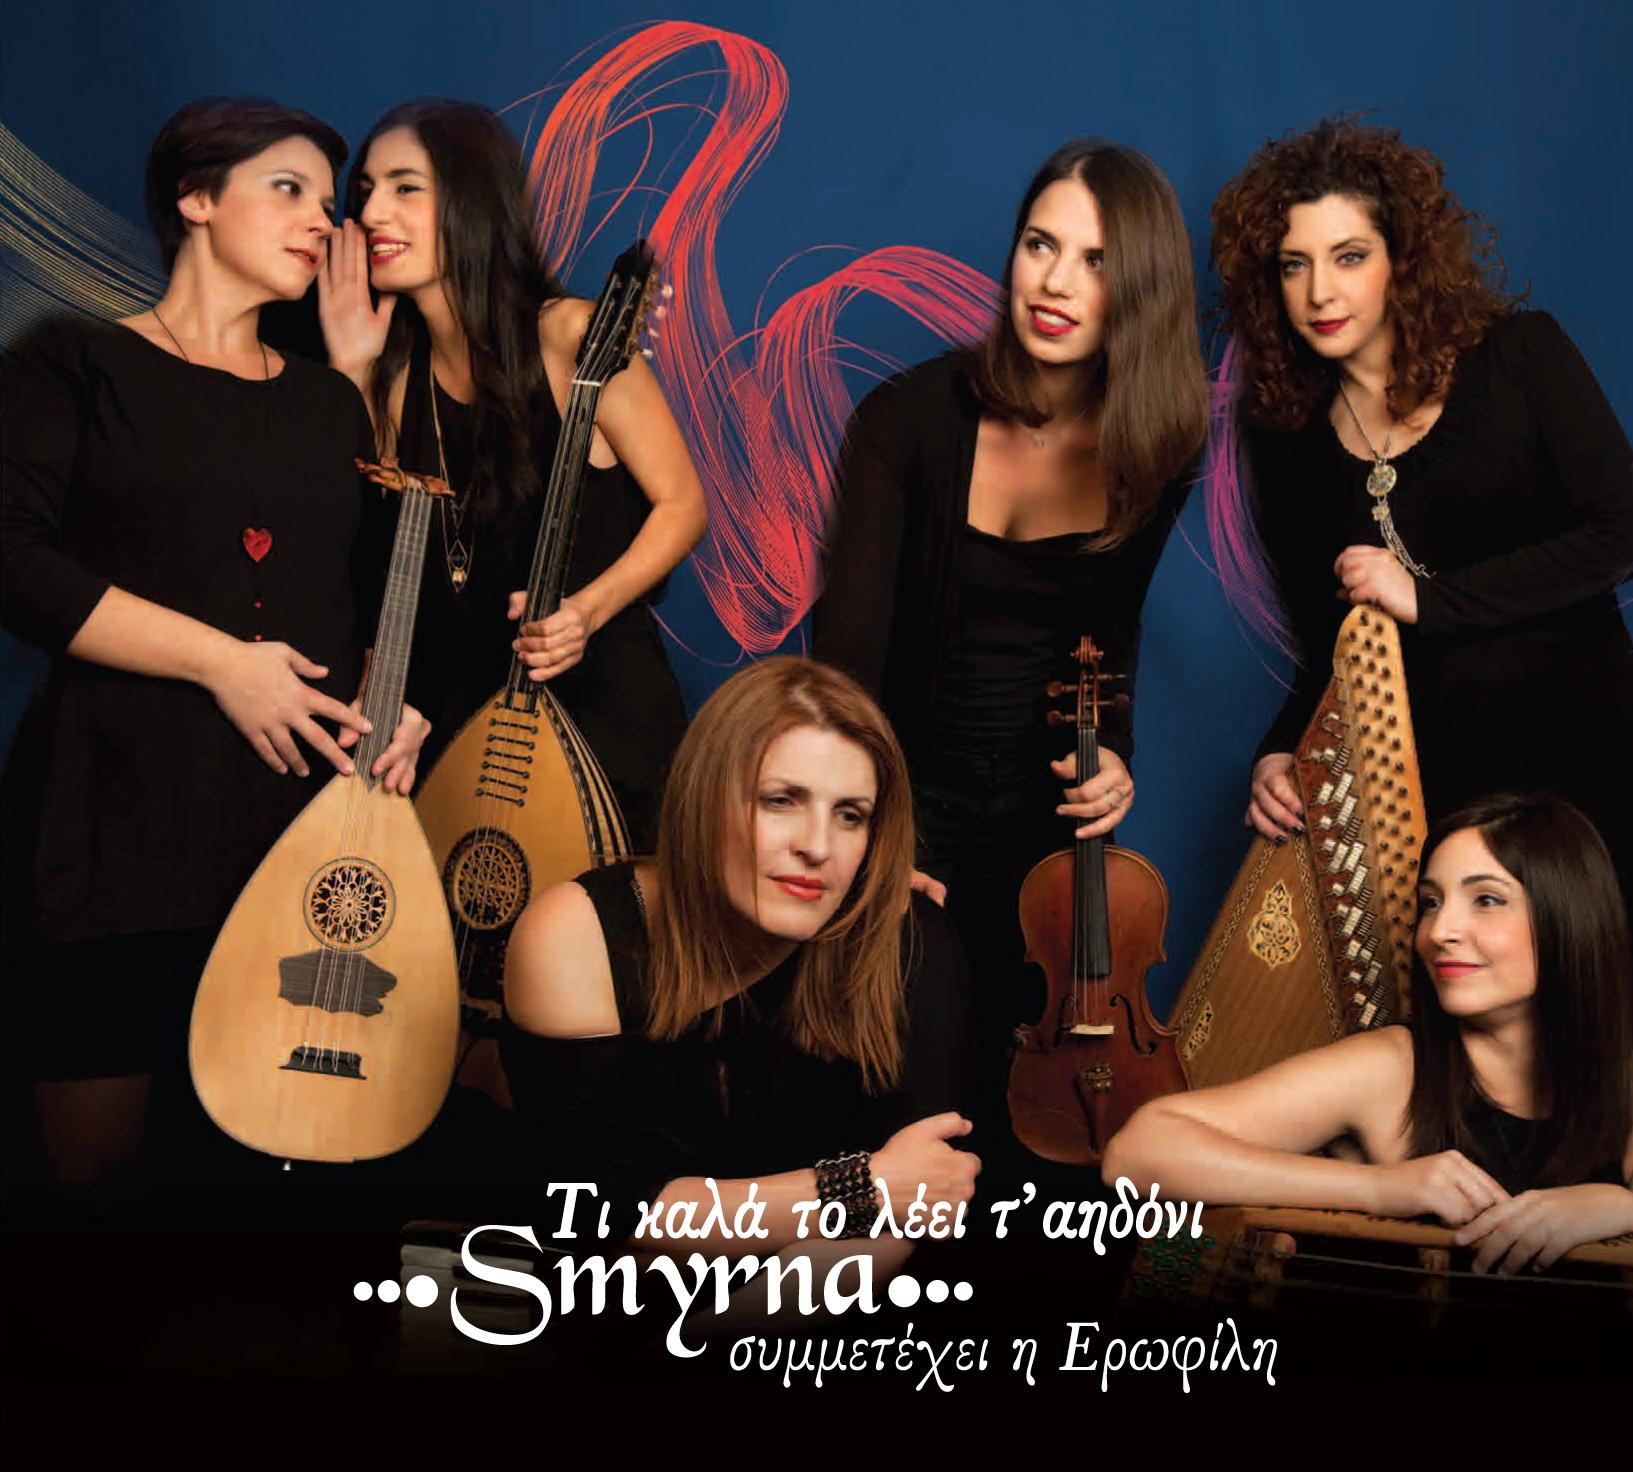 Smyrna - Τι καλά το λέει τ' αηδόνι